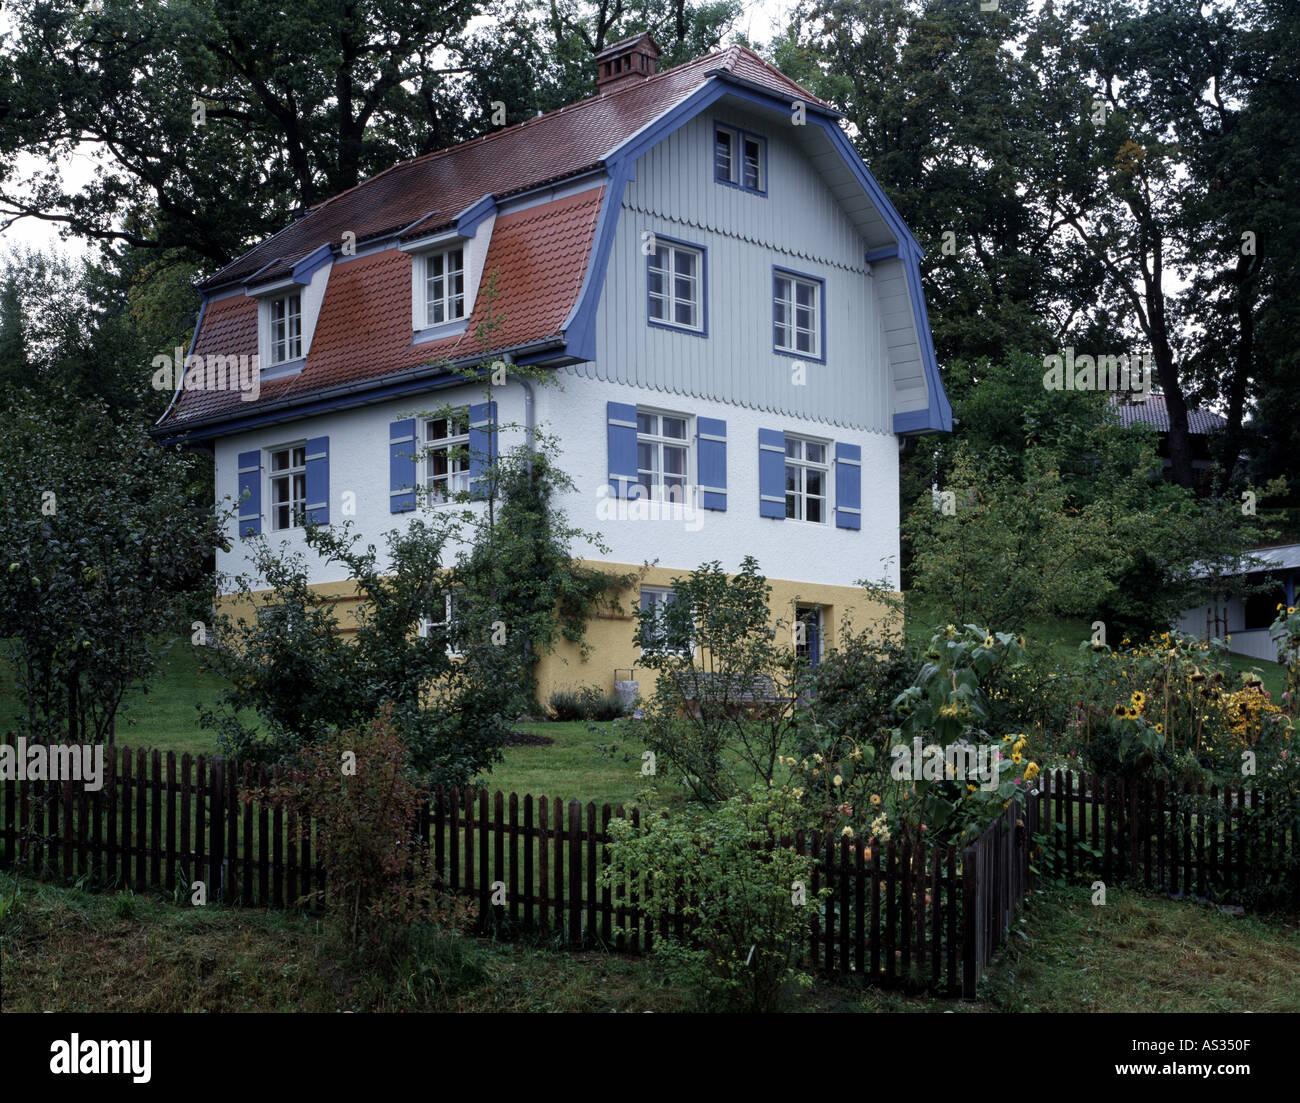 Murnau, Gabriele-Münter-Haus, \